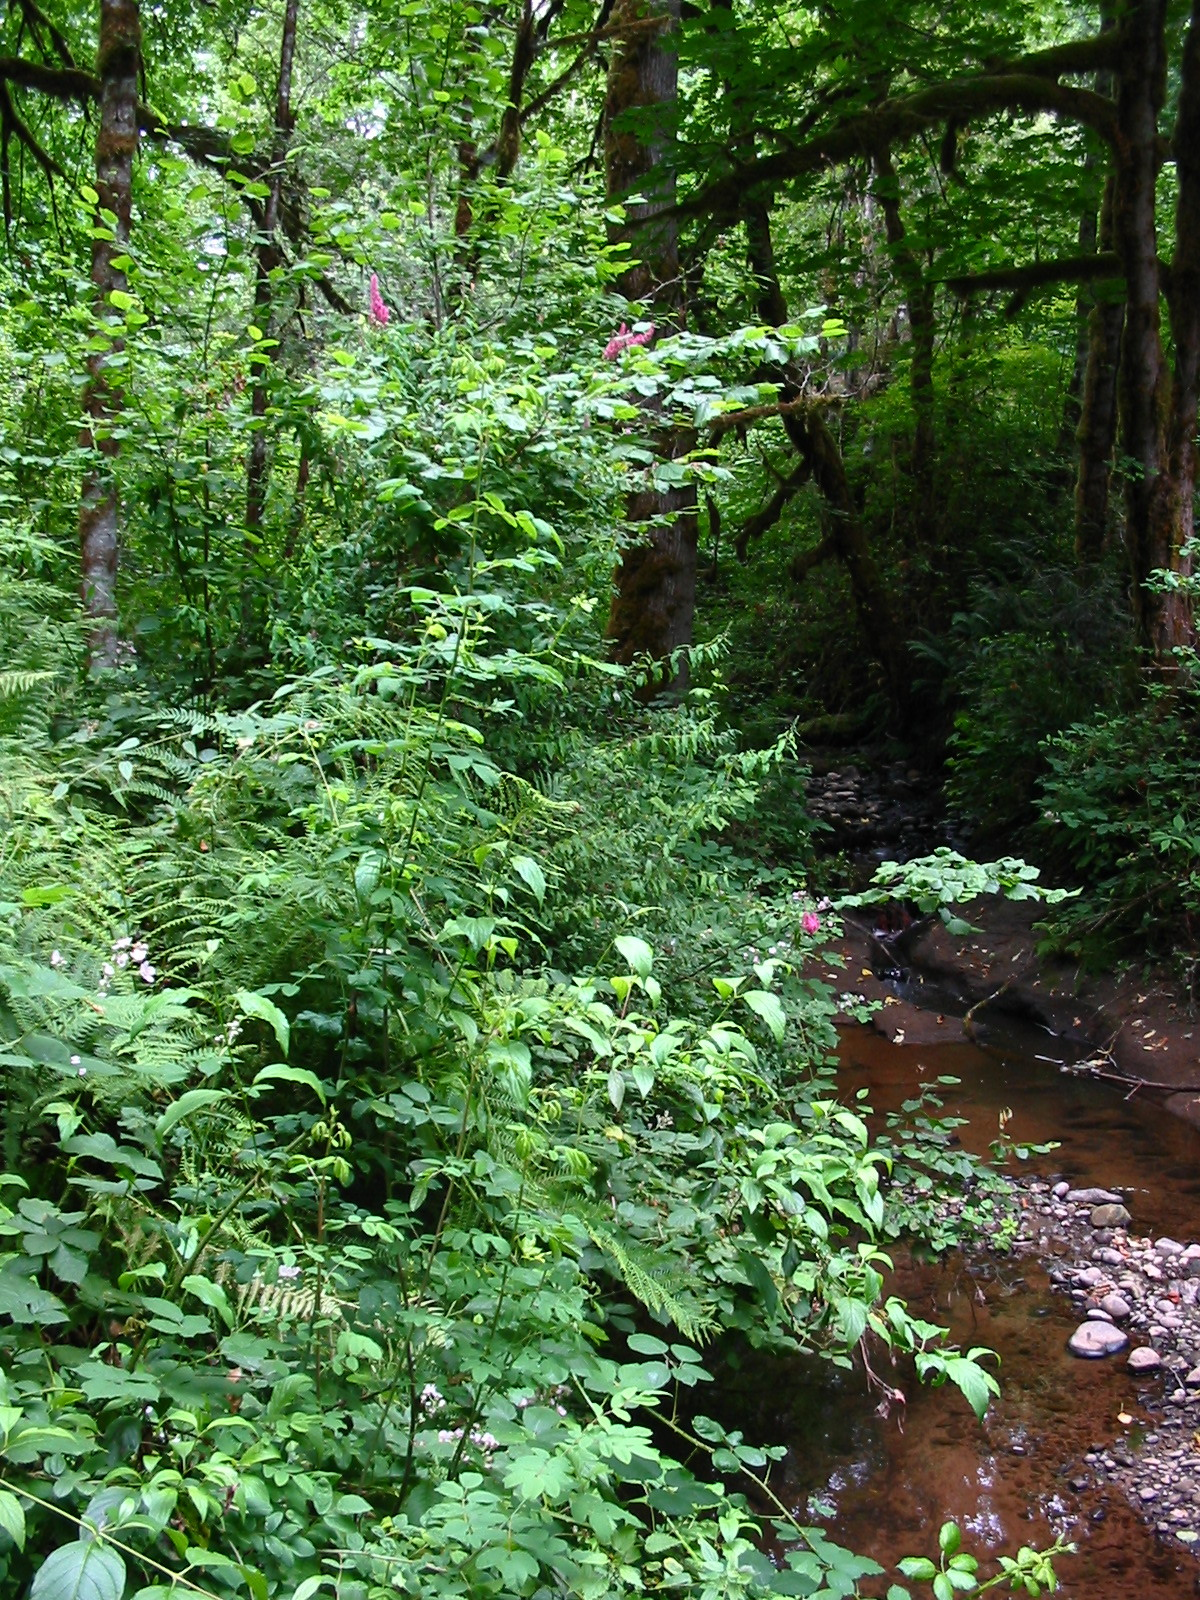 Noyer Creek, Oregon